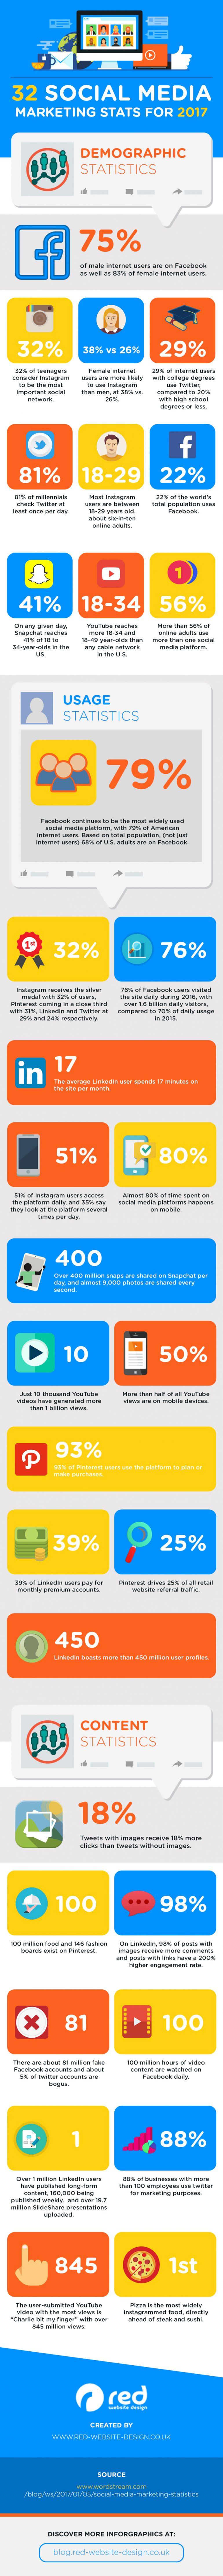 infographic socialmedia-feiten